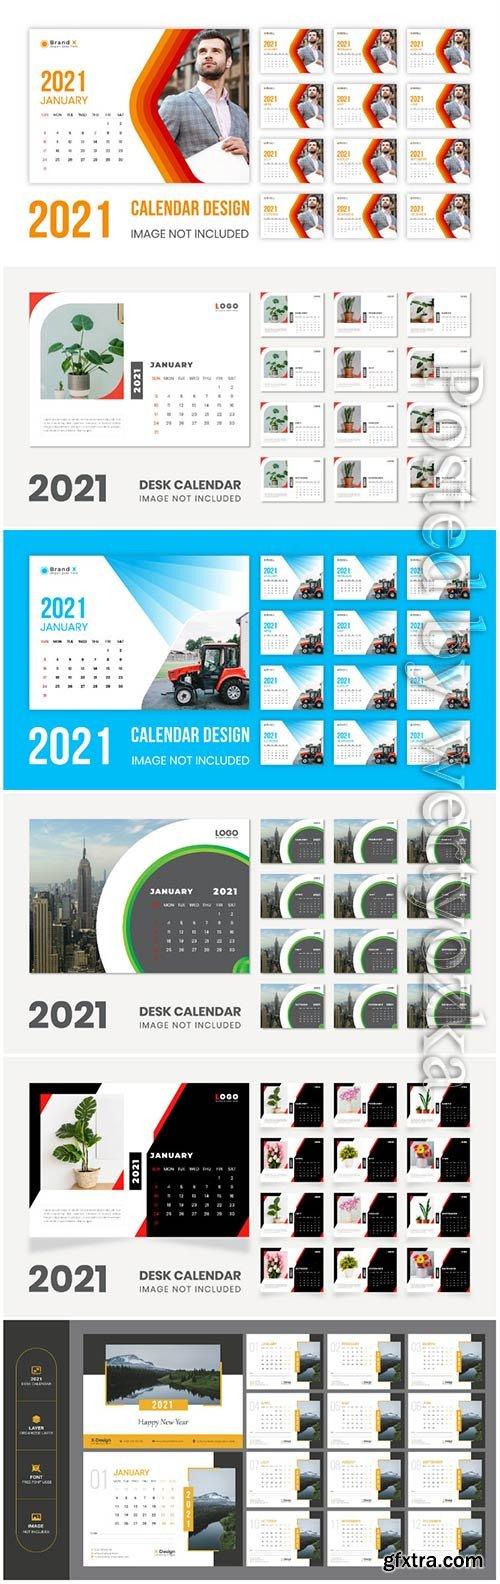 Desk calendar new year 2021